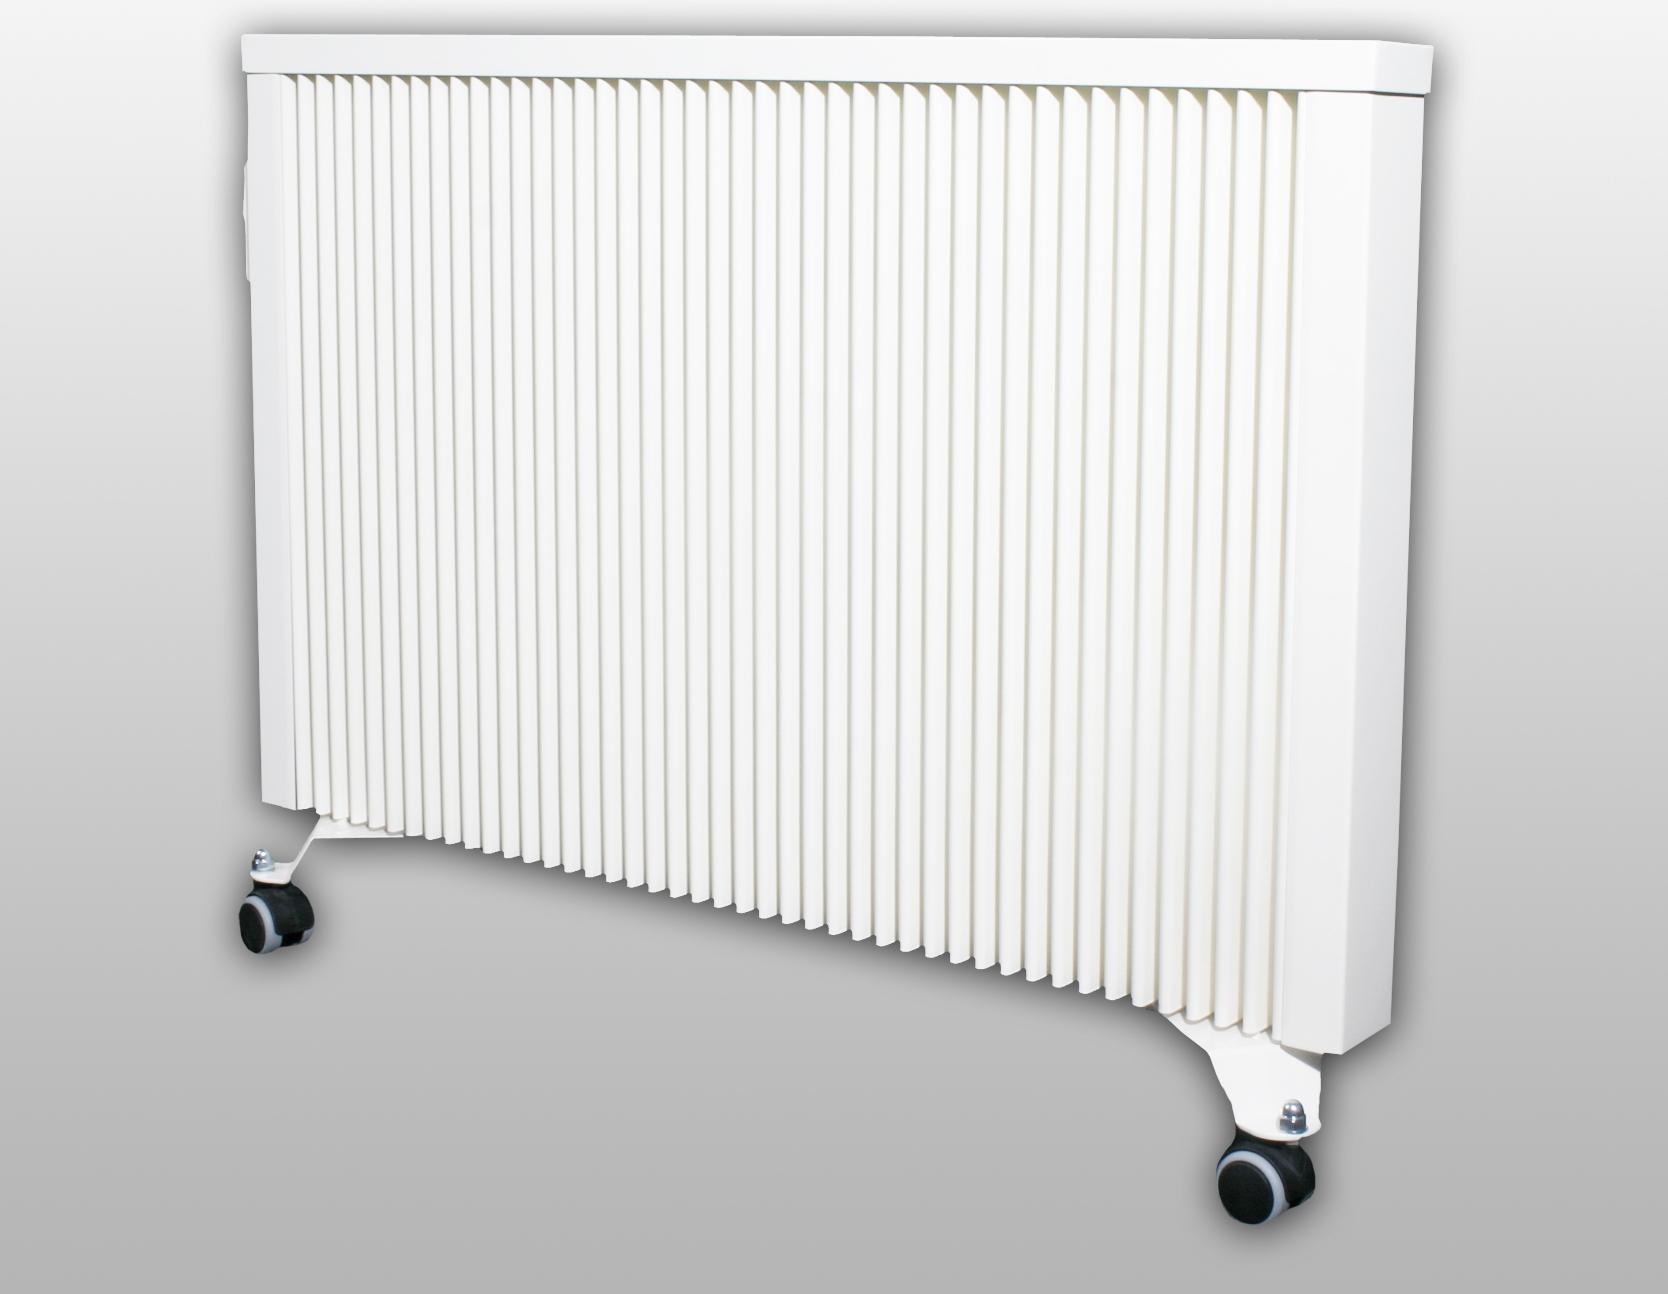 Topný panel série H, TYP H170, 1700 W